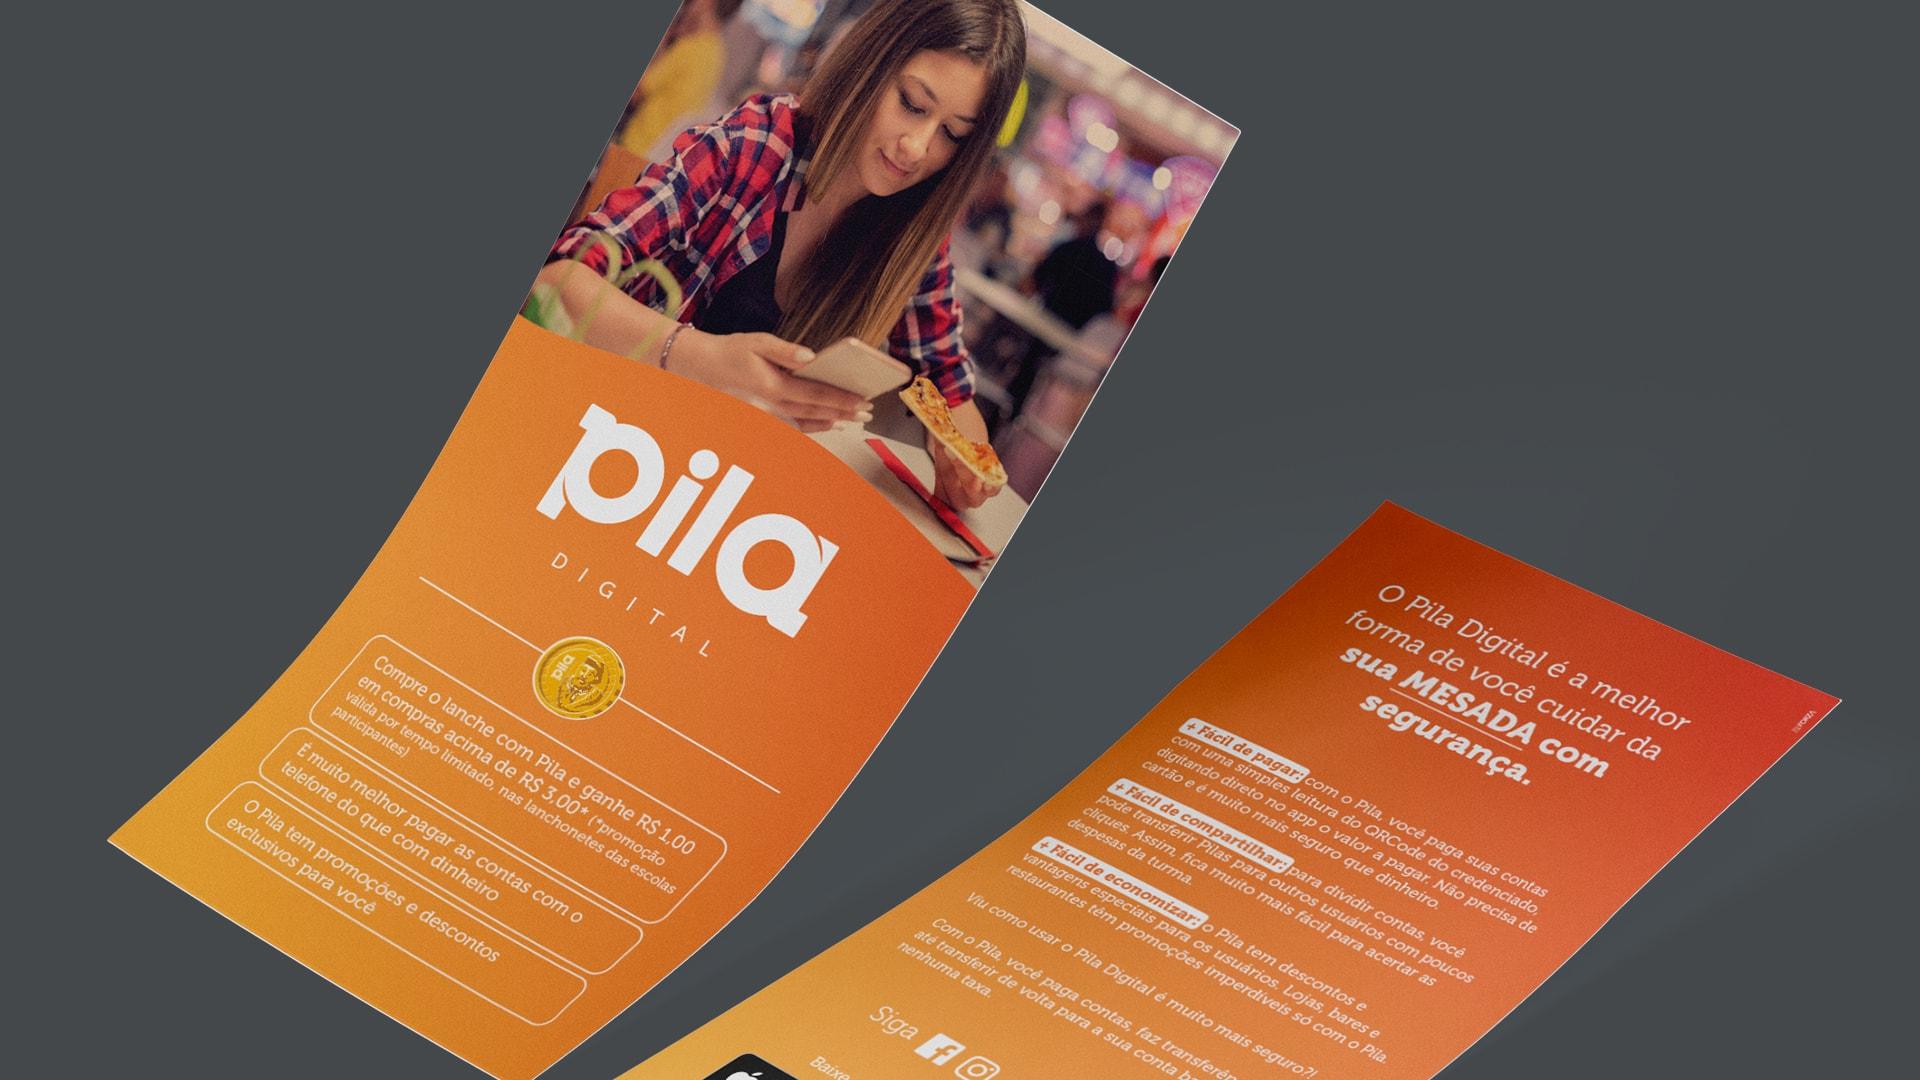 Pila Digital